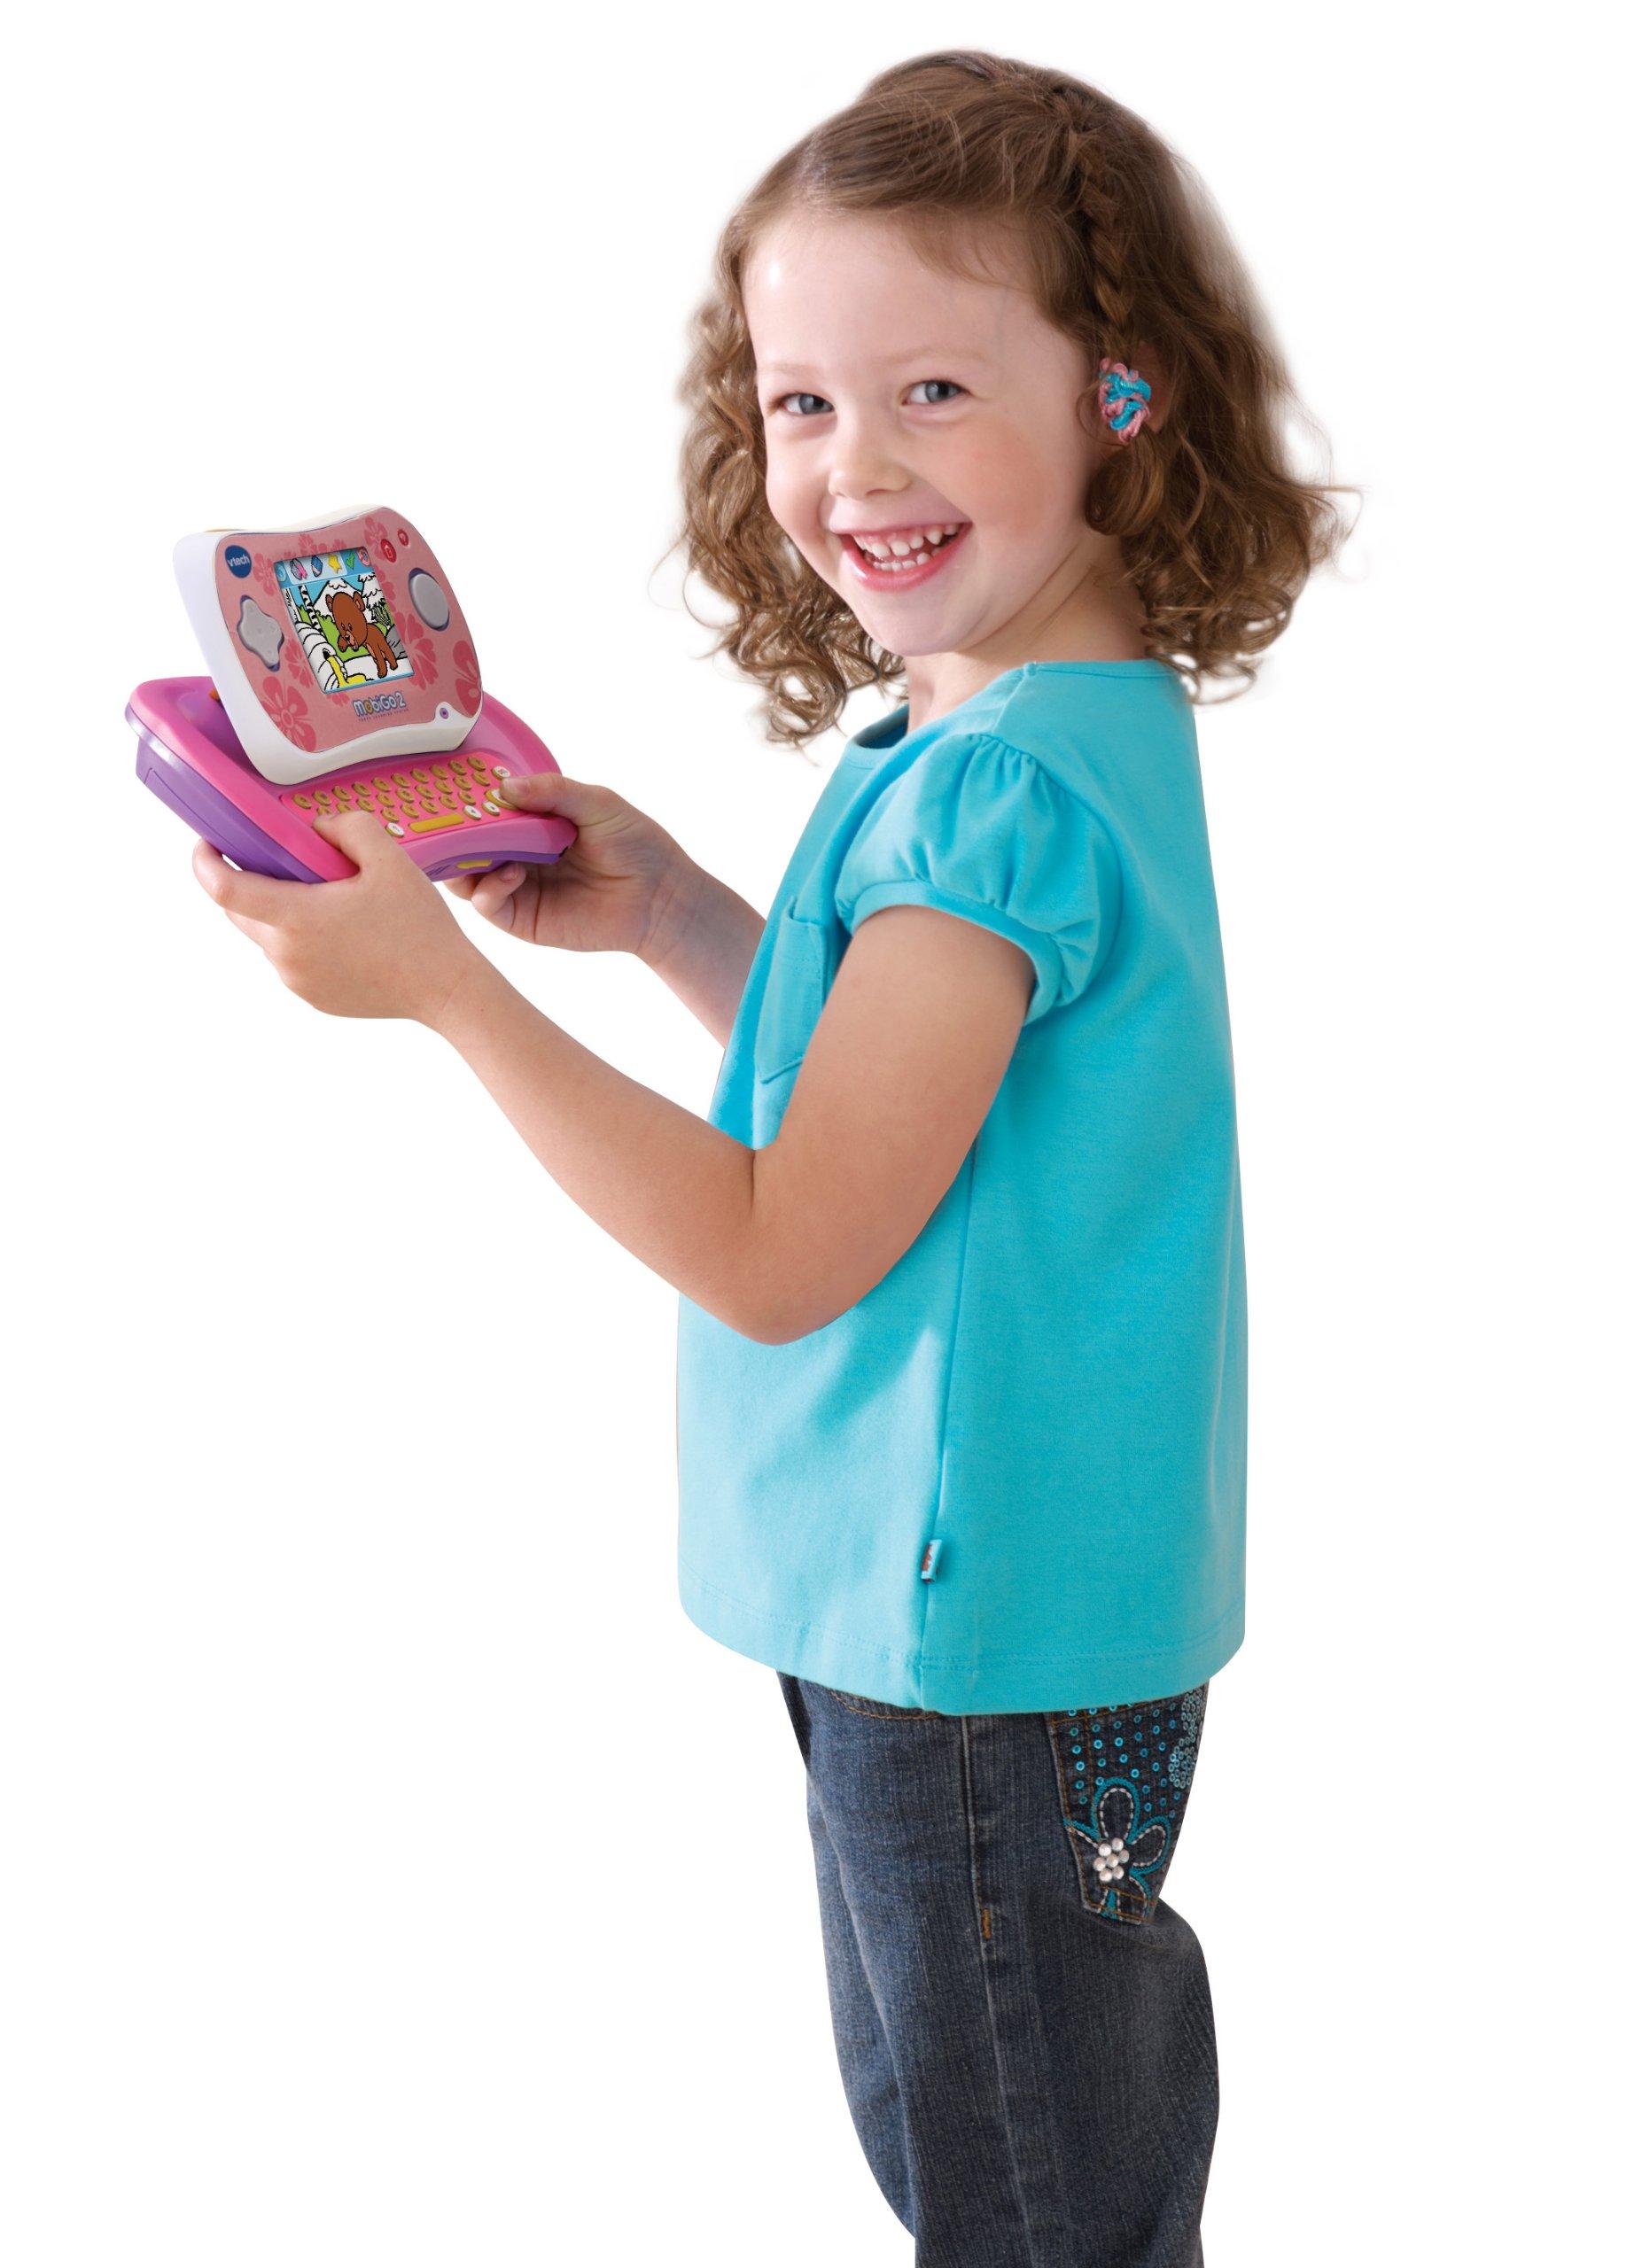 VTech MobiGo 2 Touch Learning System - Pink by VTech (Image #6)